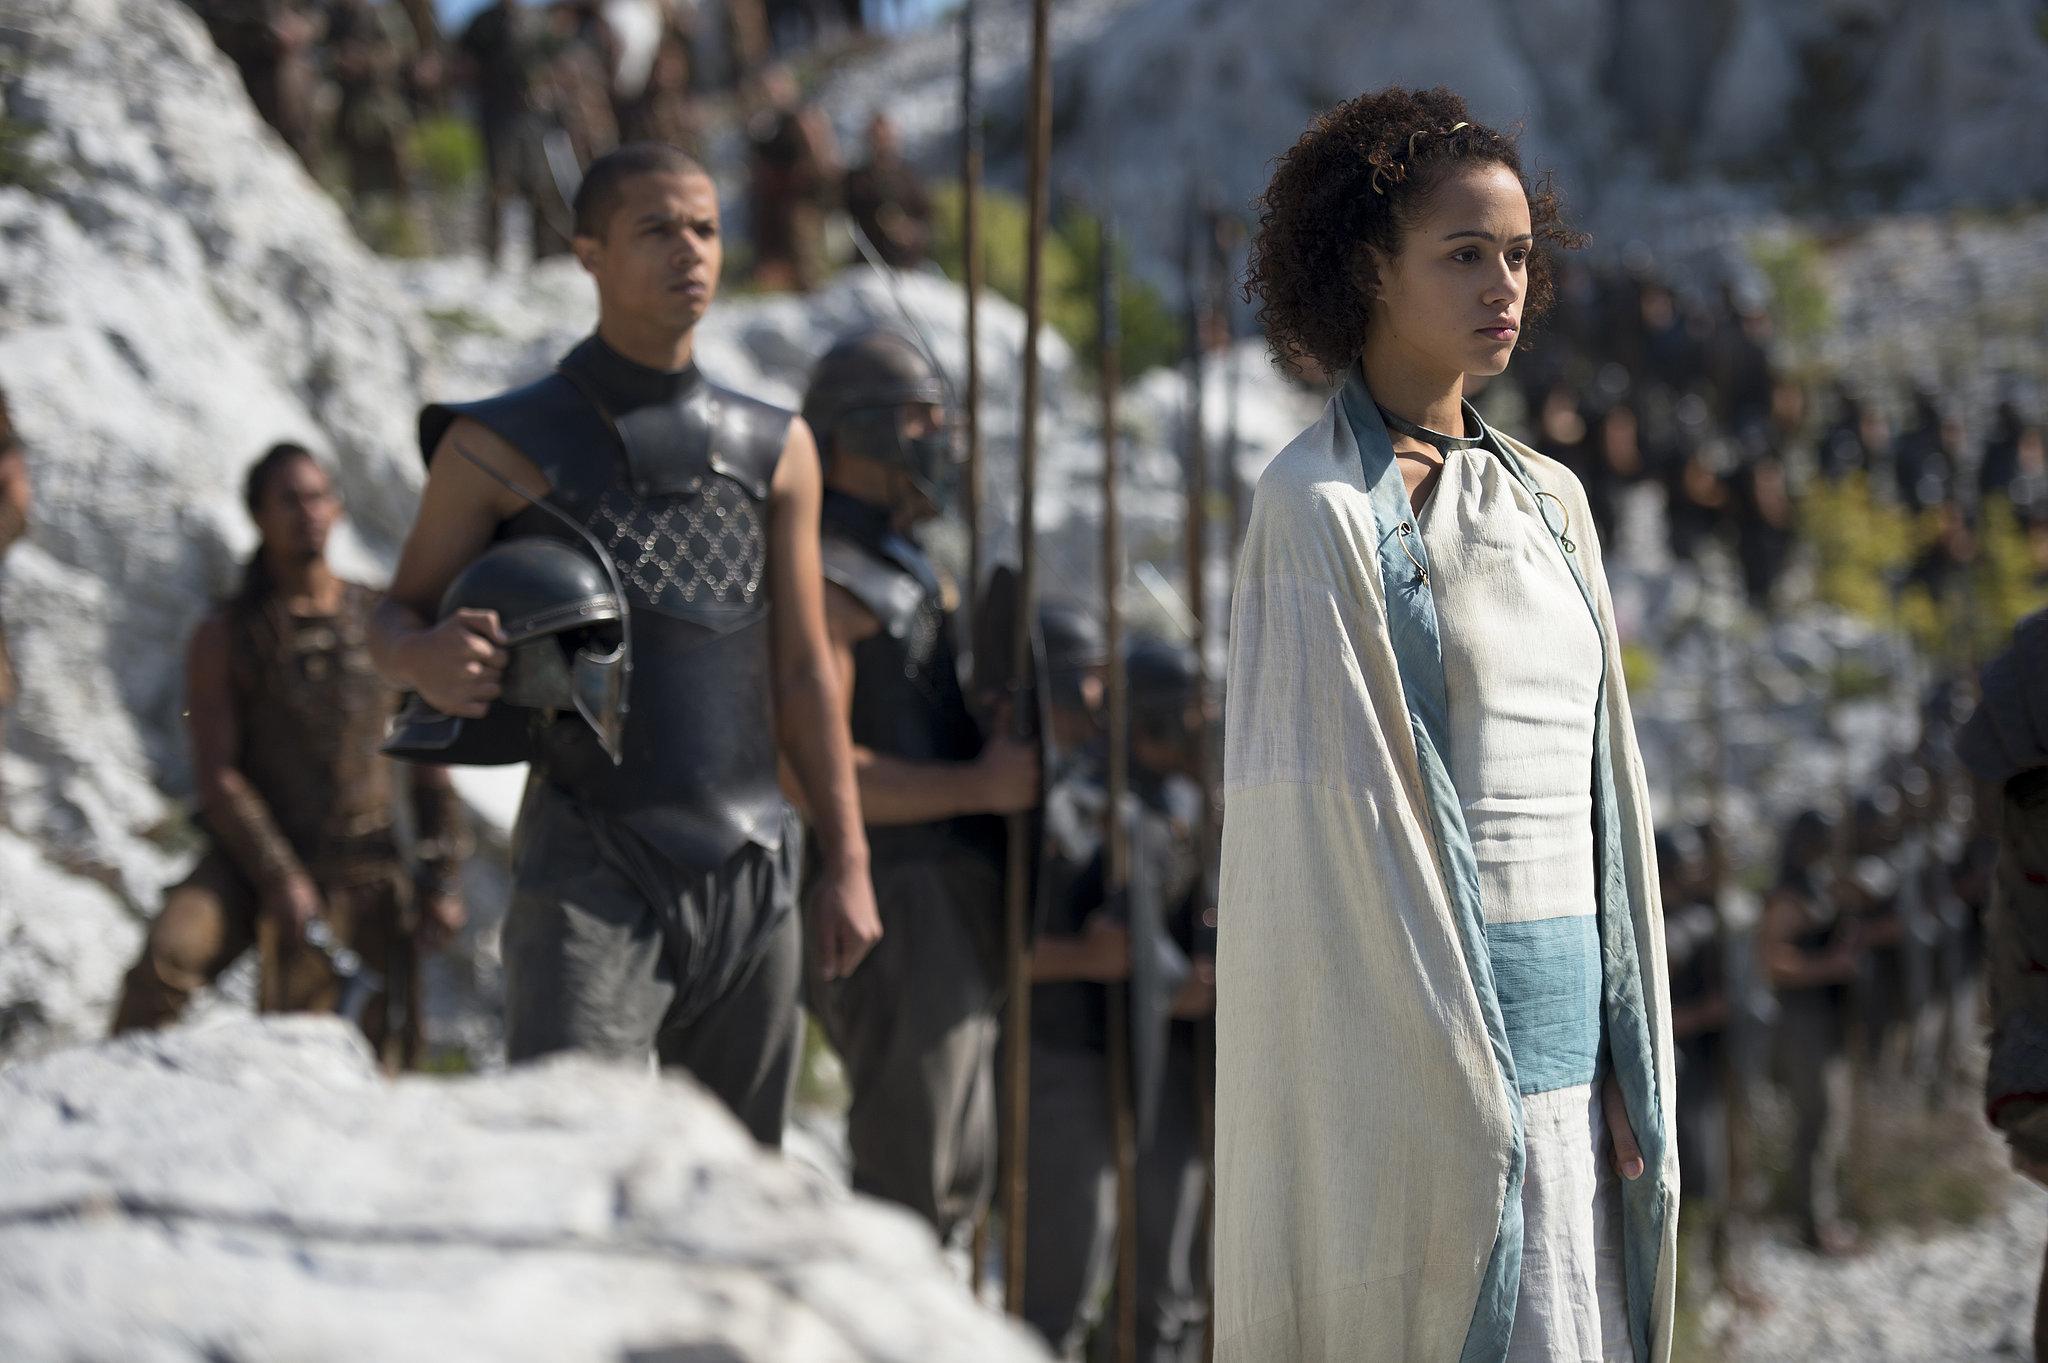 Daenerys's entourage looks ready for action.